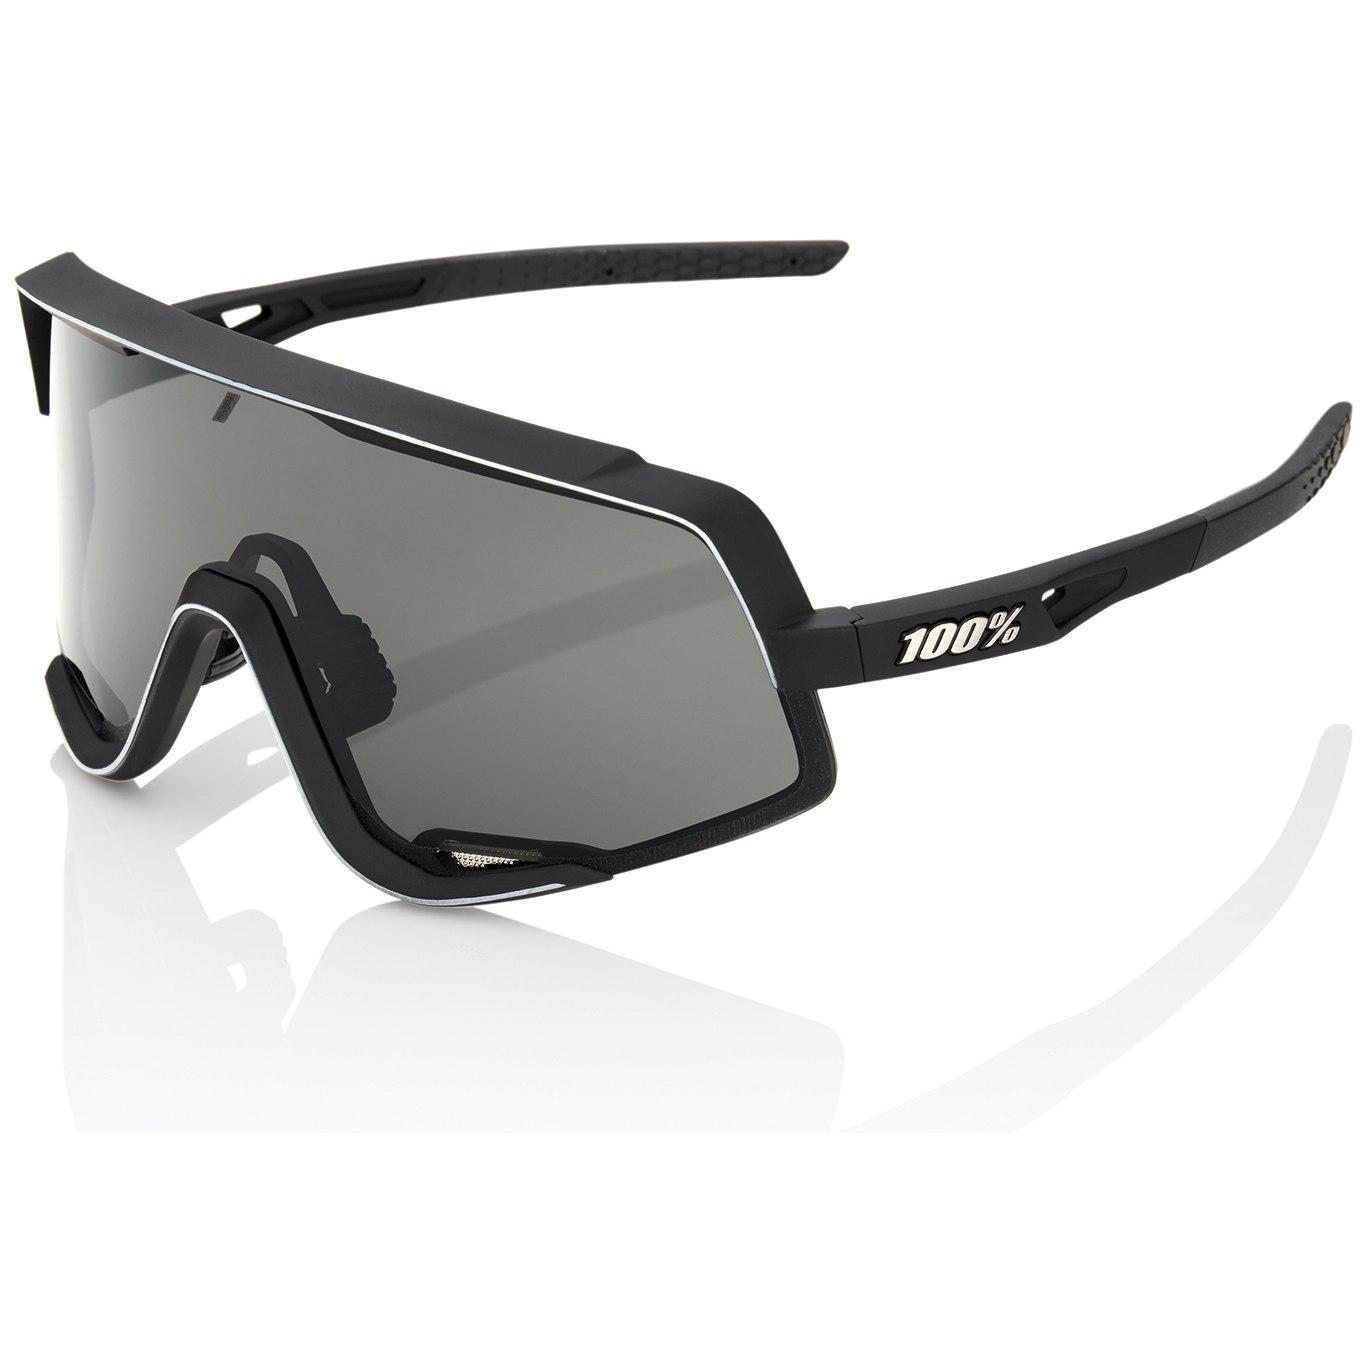 100% Glendale Glasses - Soft Tact Black/Smoke + Clear